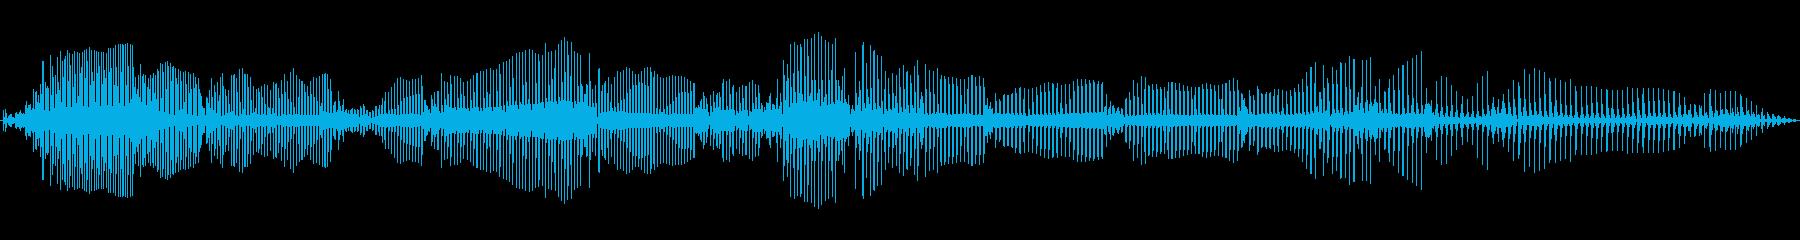 TUBA:タンブルダウン、漫画コメ...の再生済みの波形